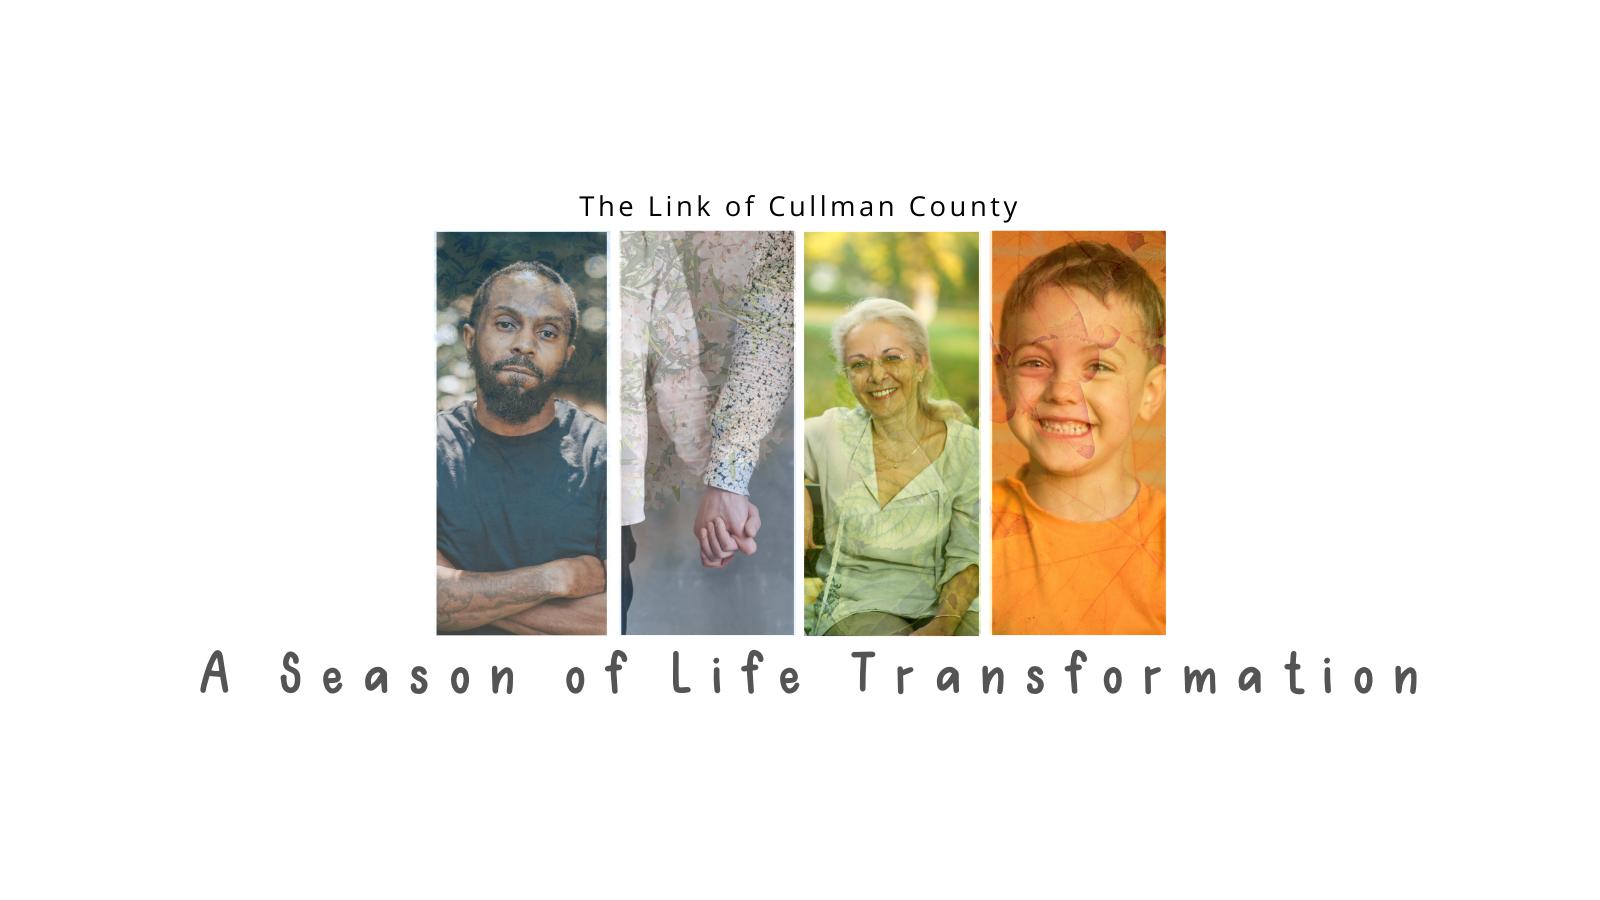 Season of Life Transformation